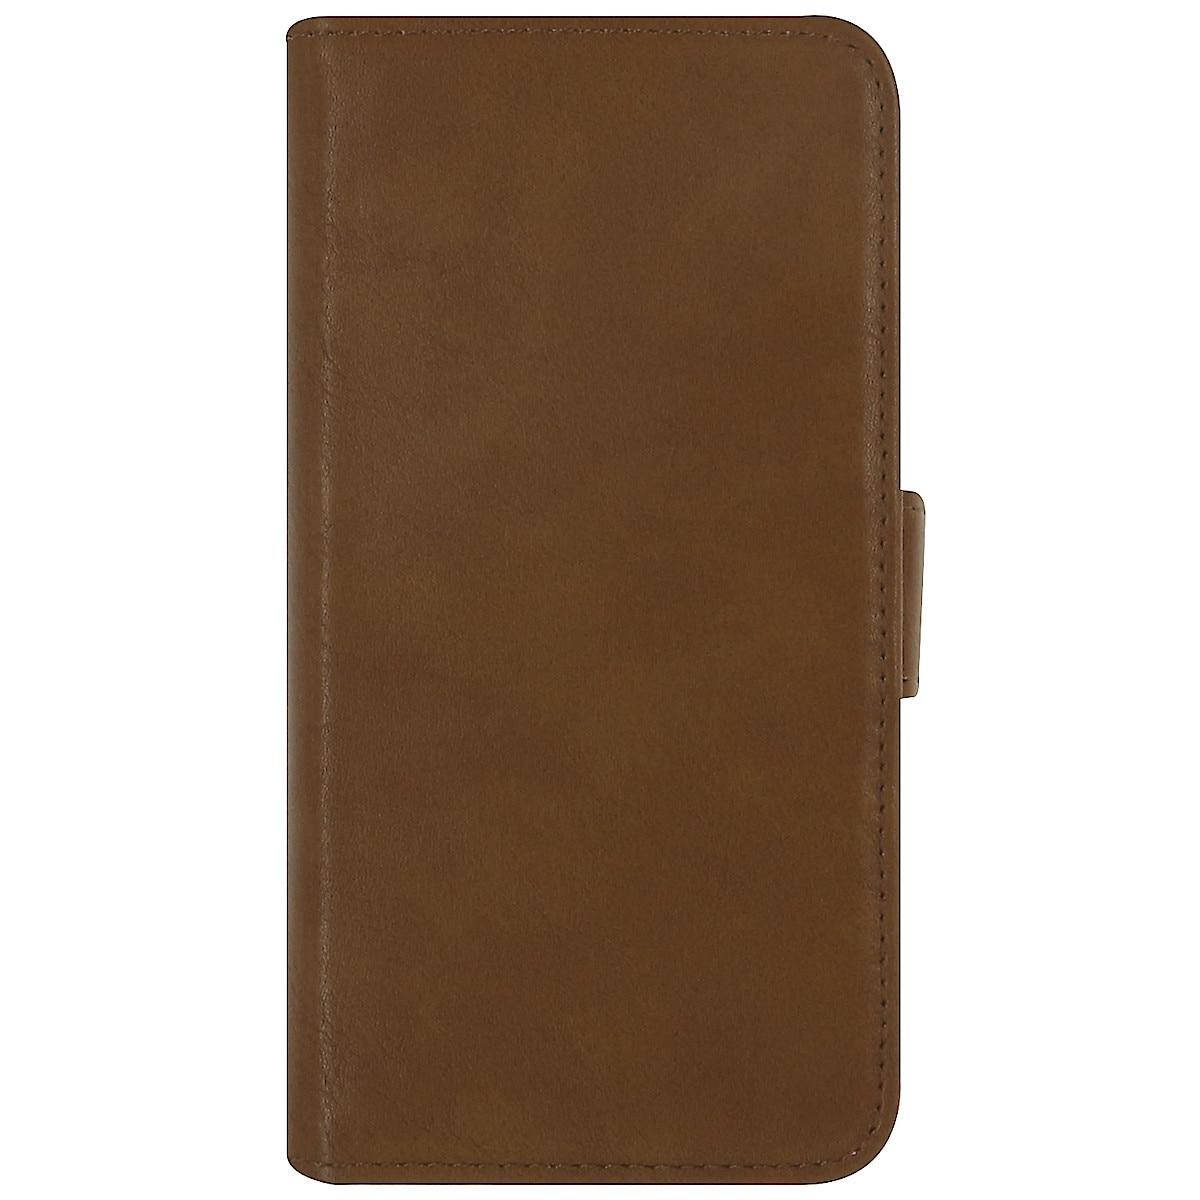 Plånboksfodral för iPhone 6/6s/7/8 Holdit